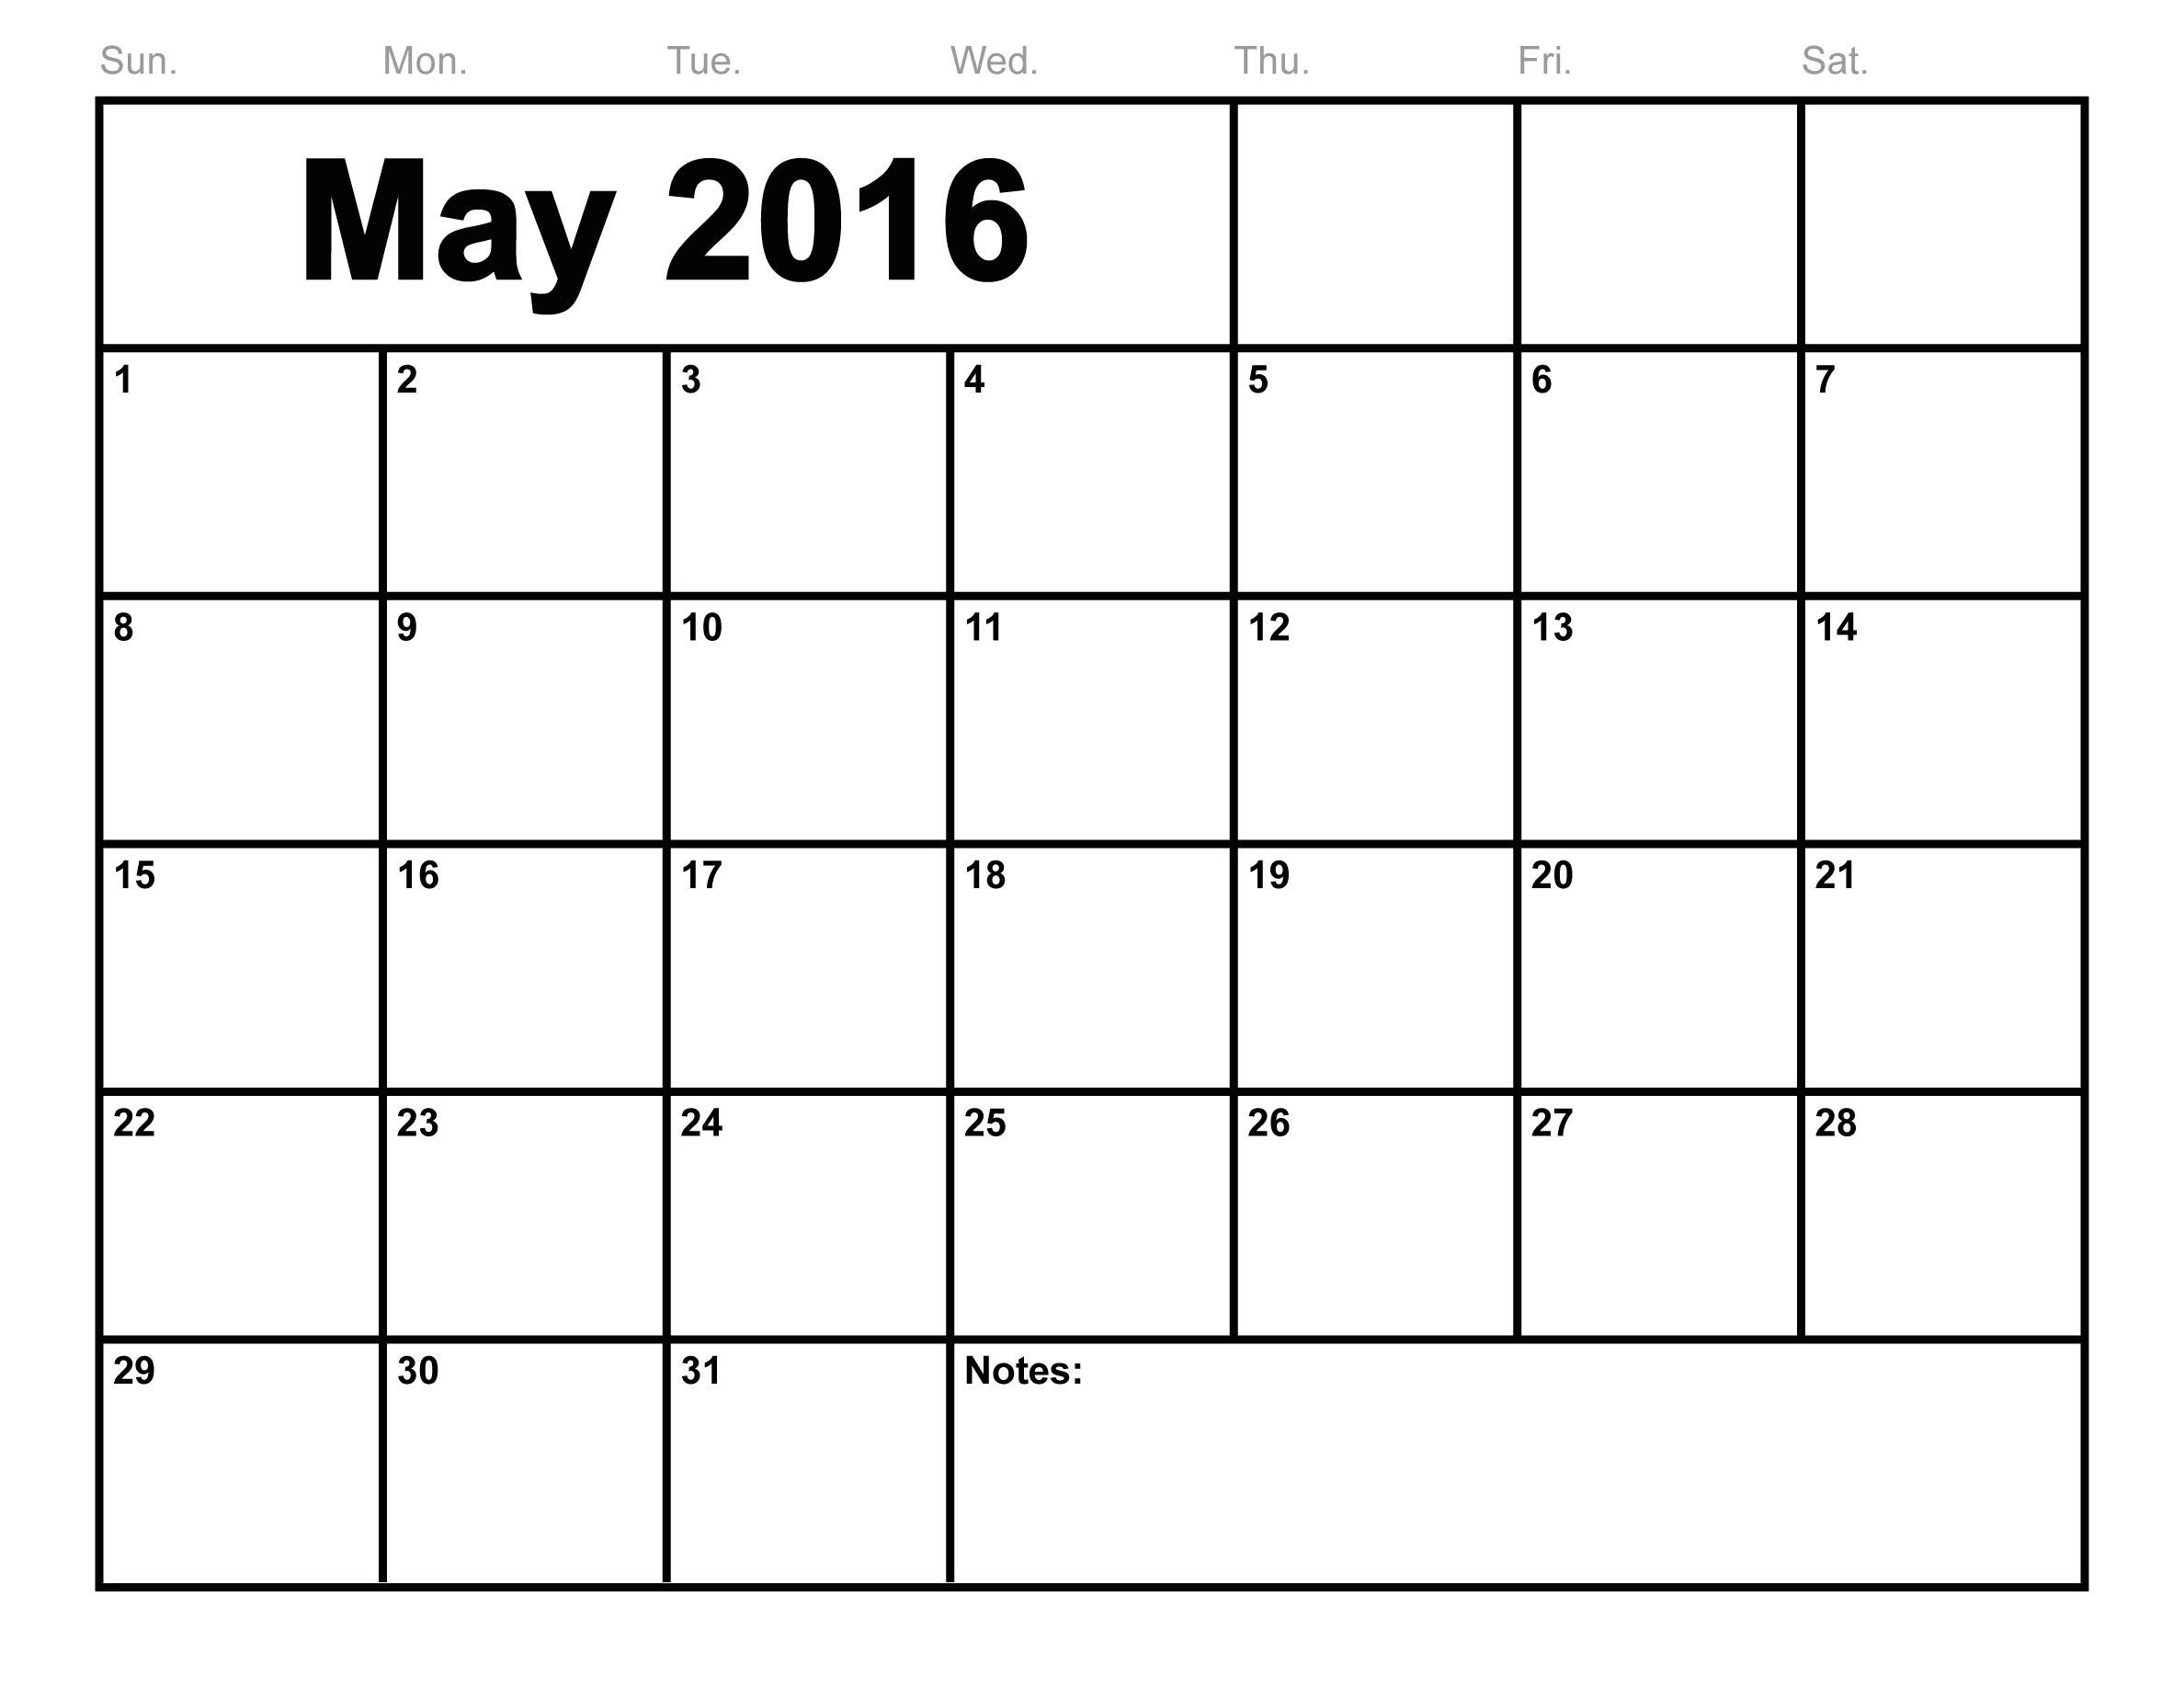 May 2016 Calendar Printable Template (8 Templates) | Transitional